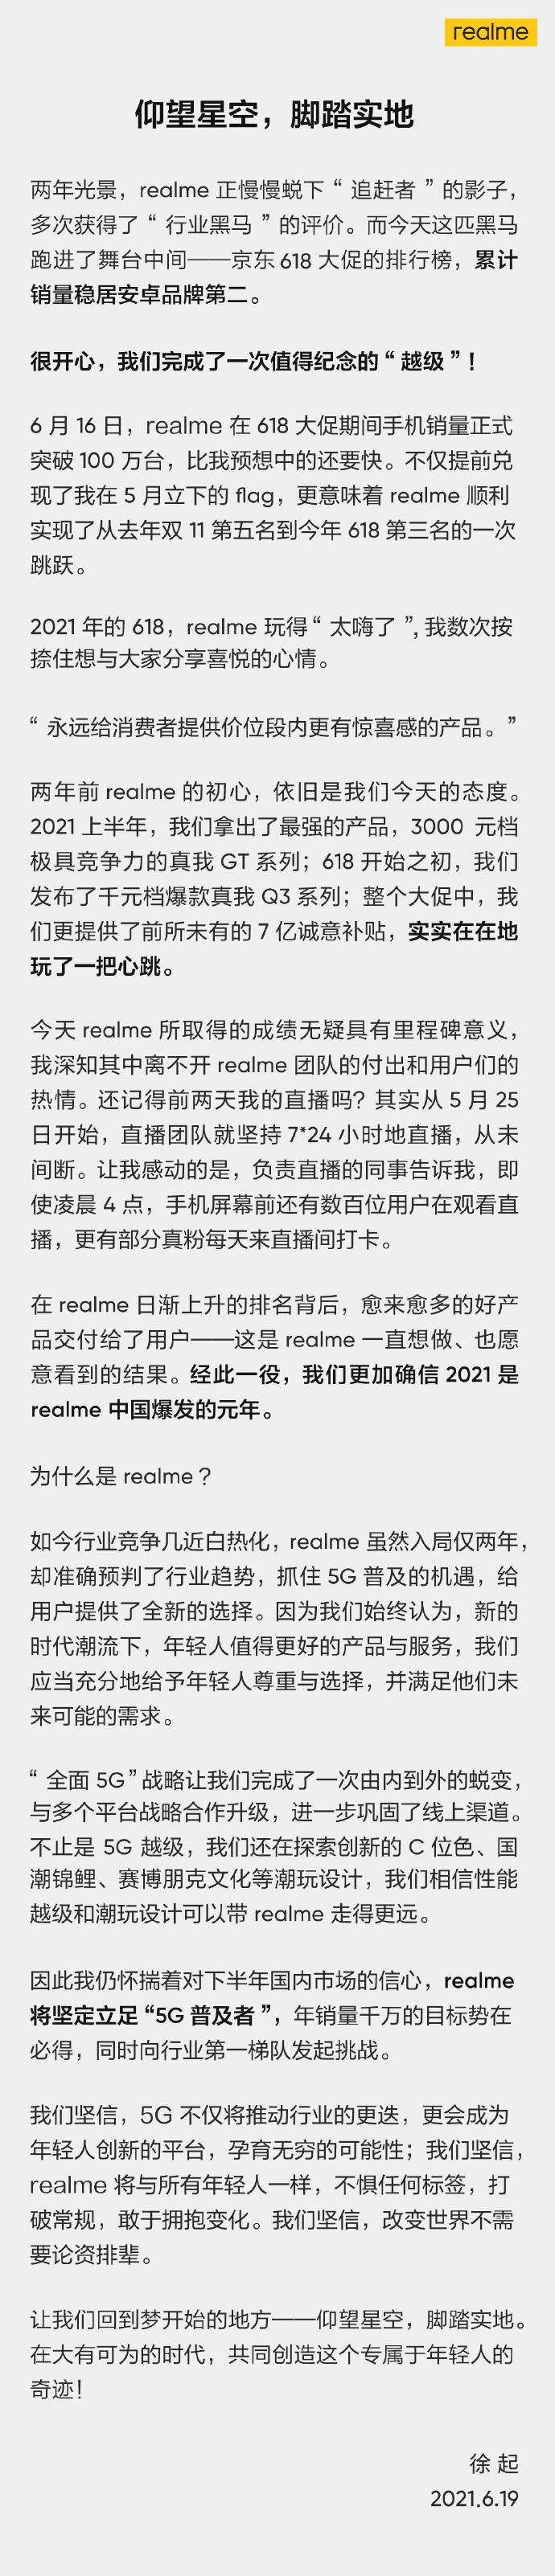 realme计划书公布:三年内拿下线上第一